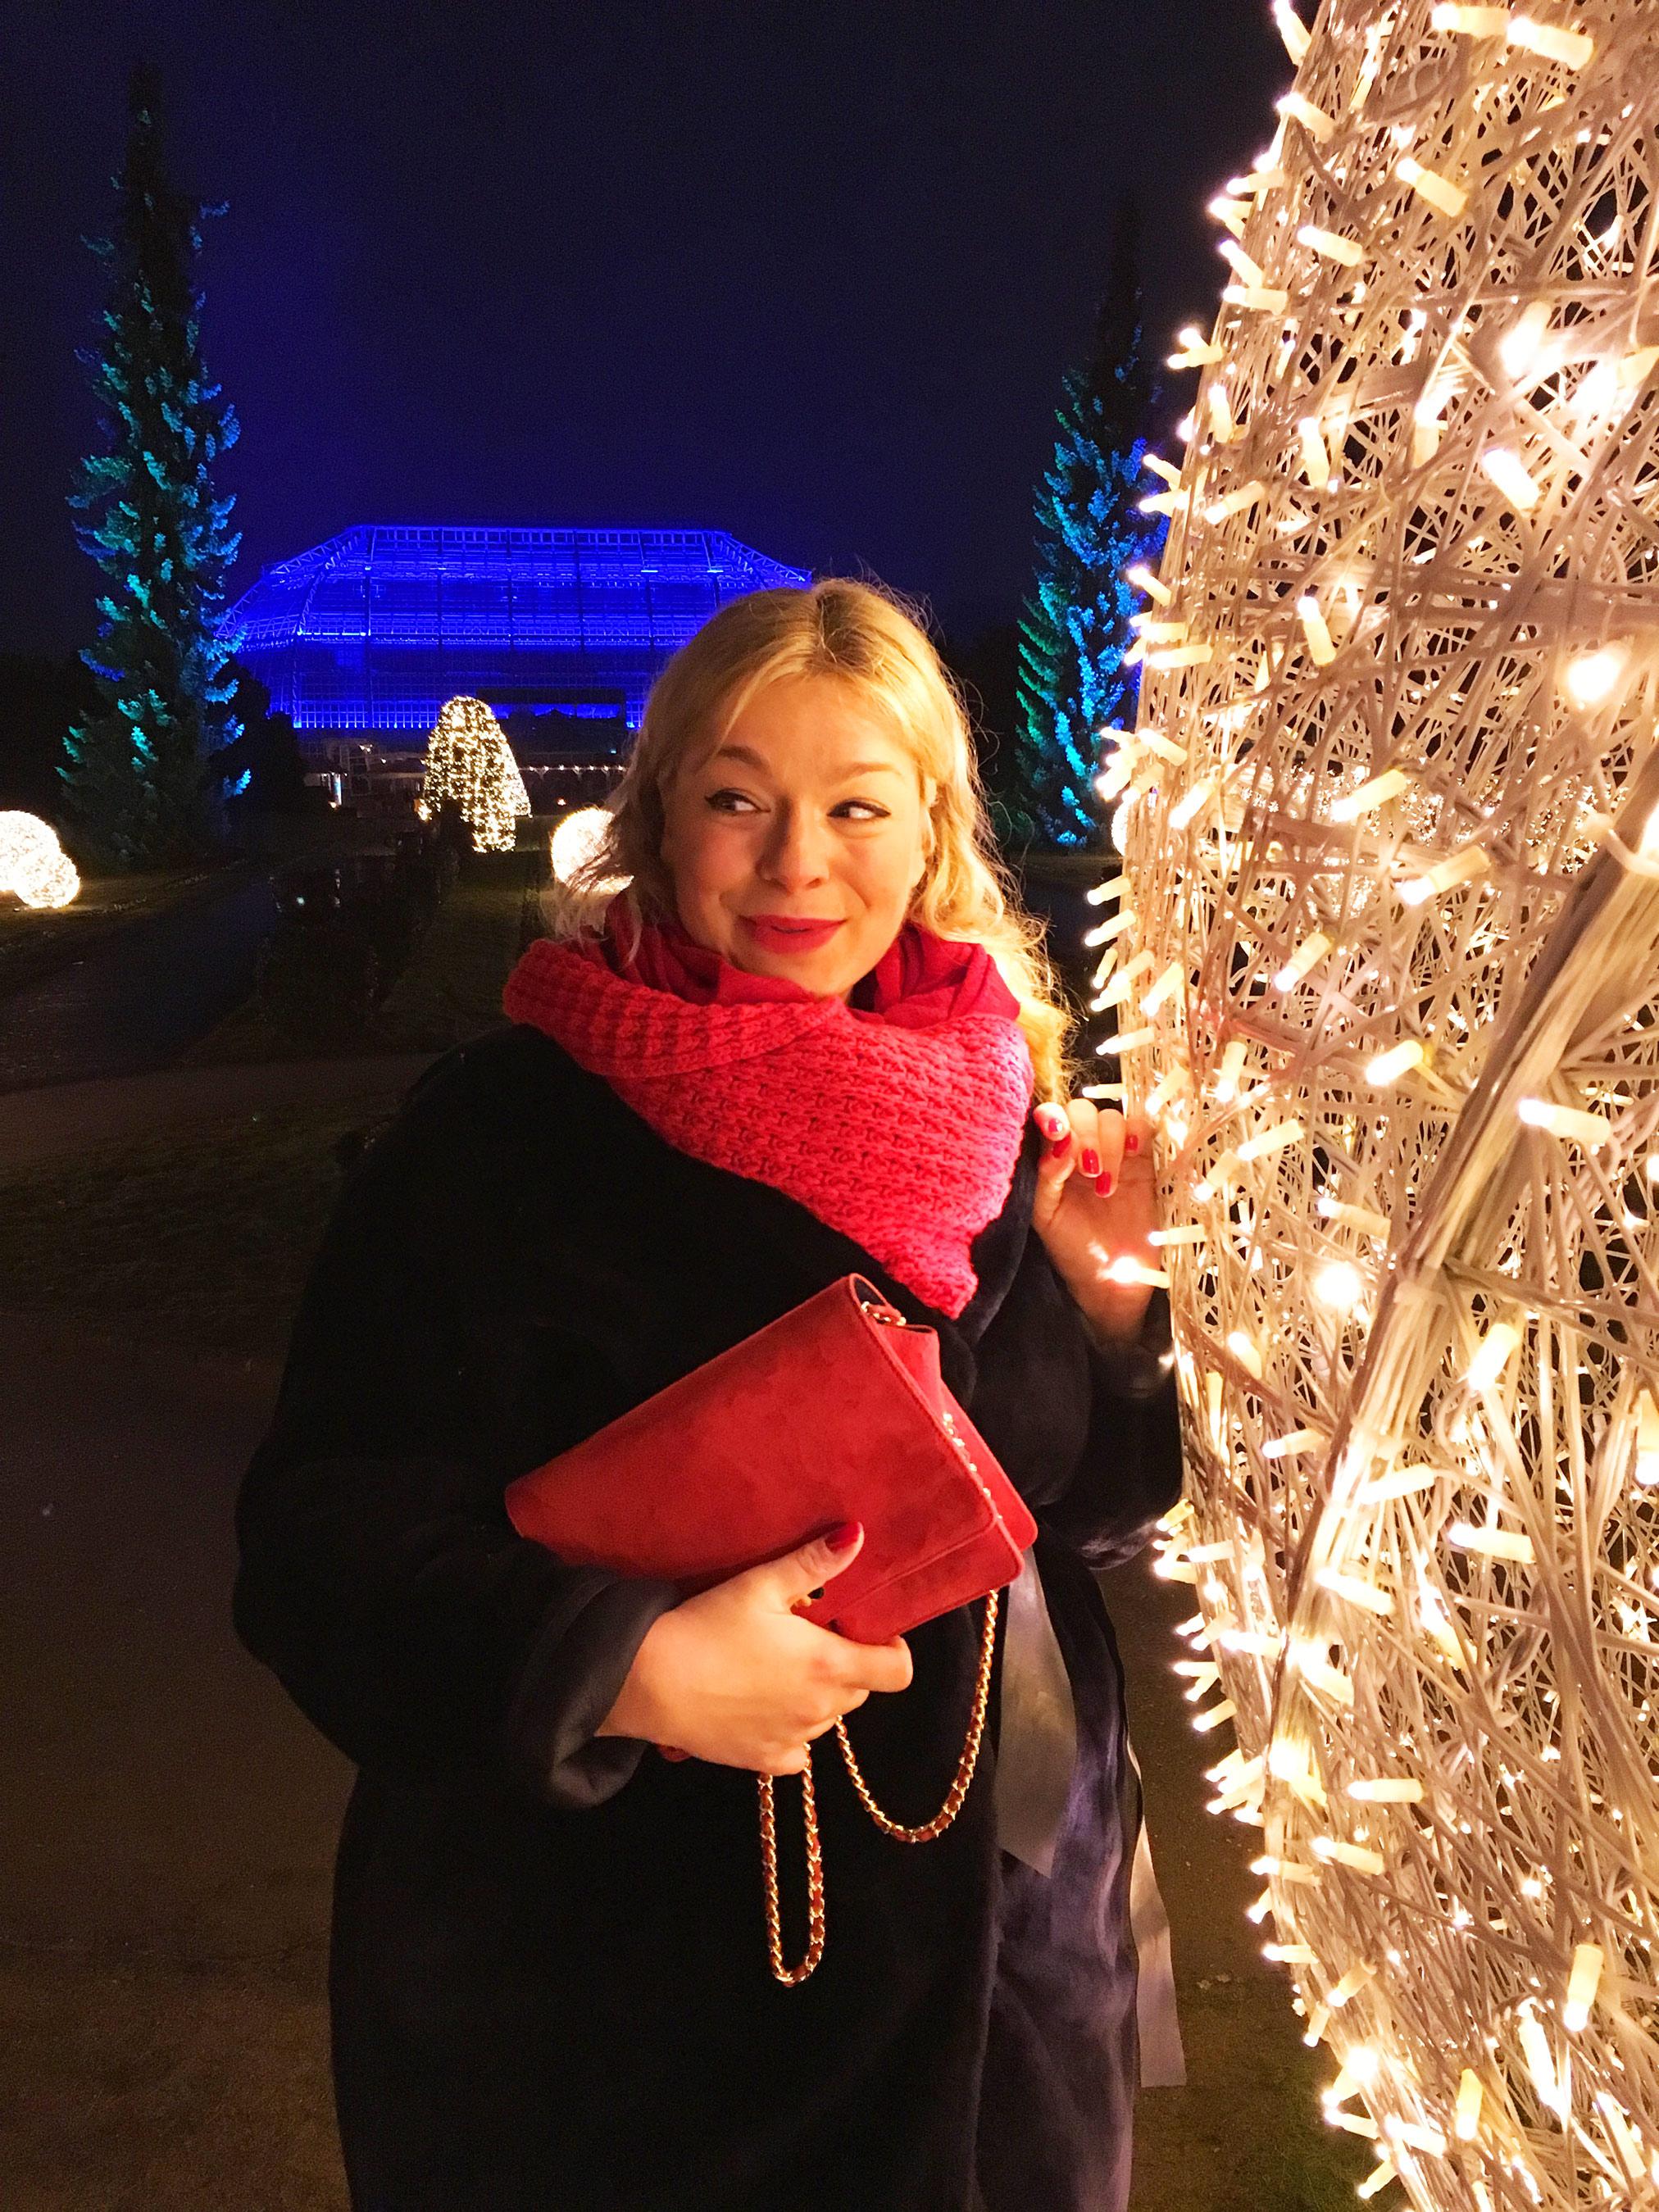 christmasgardenberlin-berlin-blog-megabambi-caterina-berlin-pogorzelski